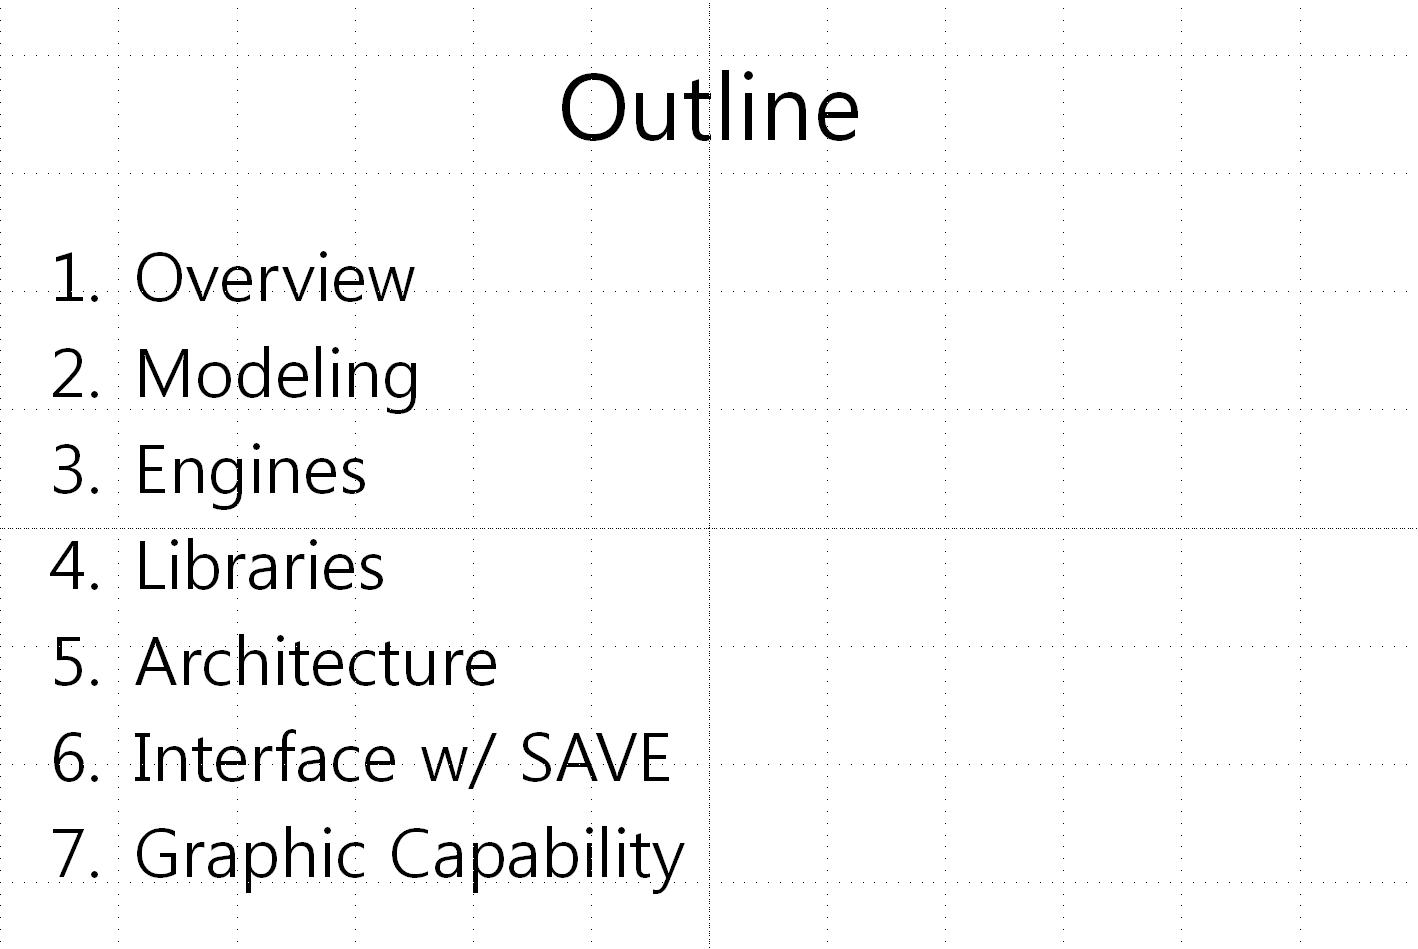 ppt-outline.png